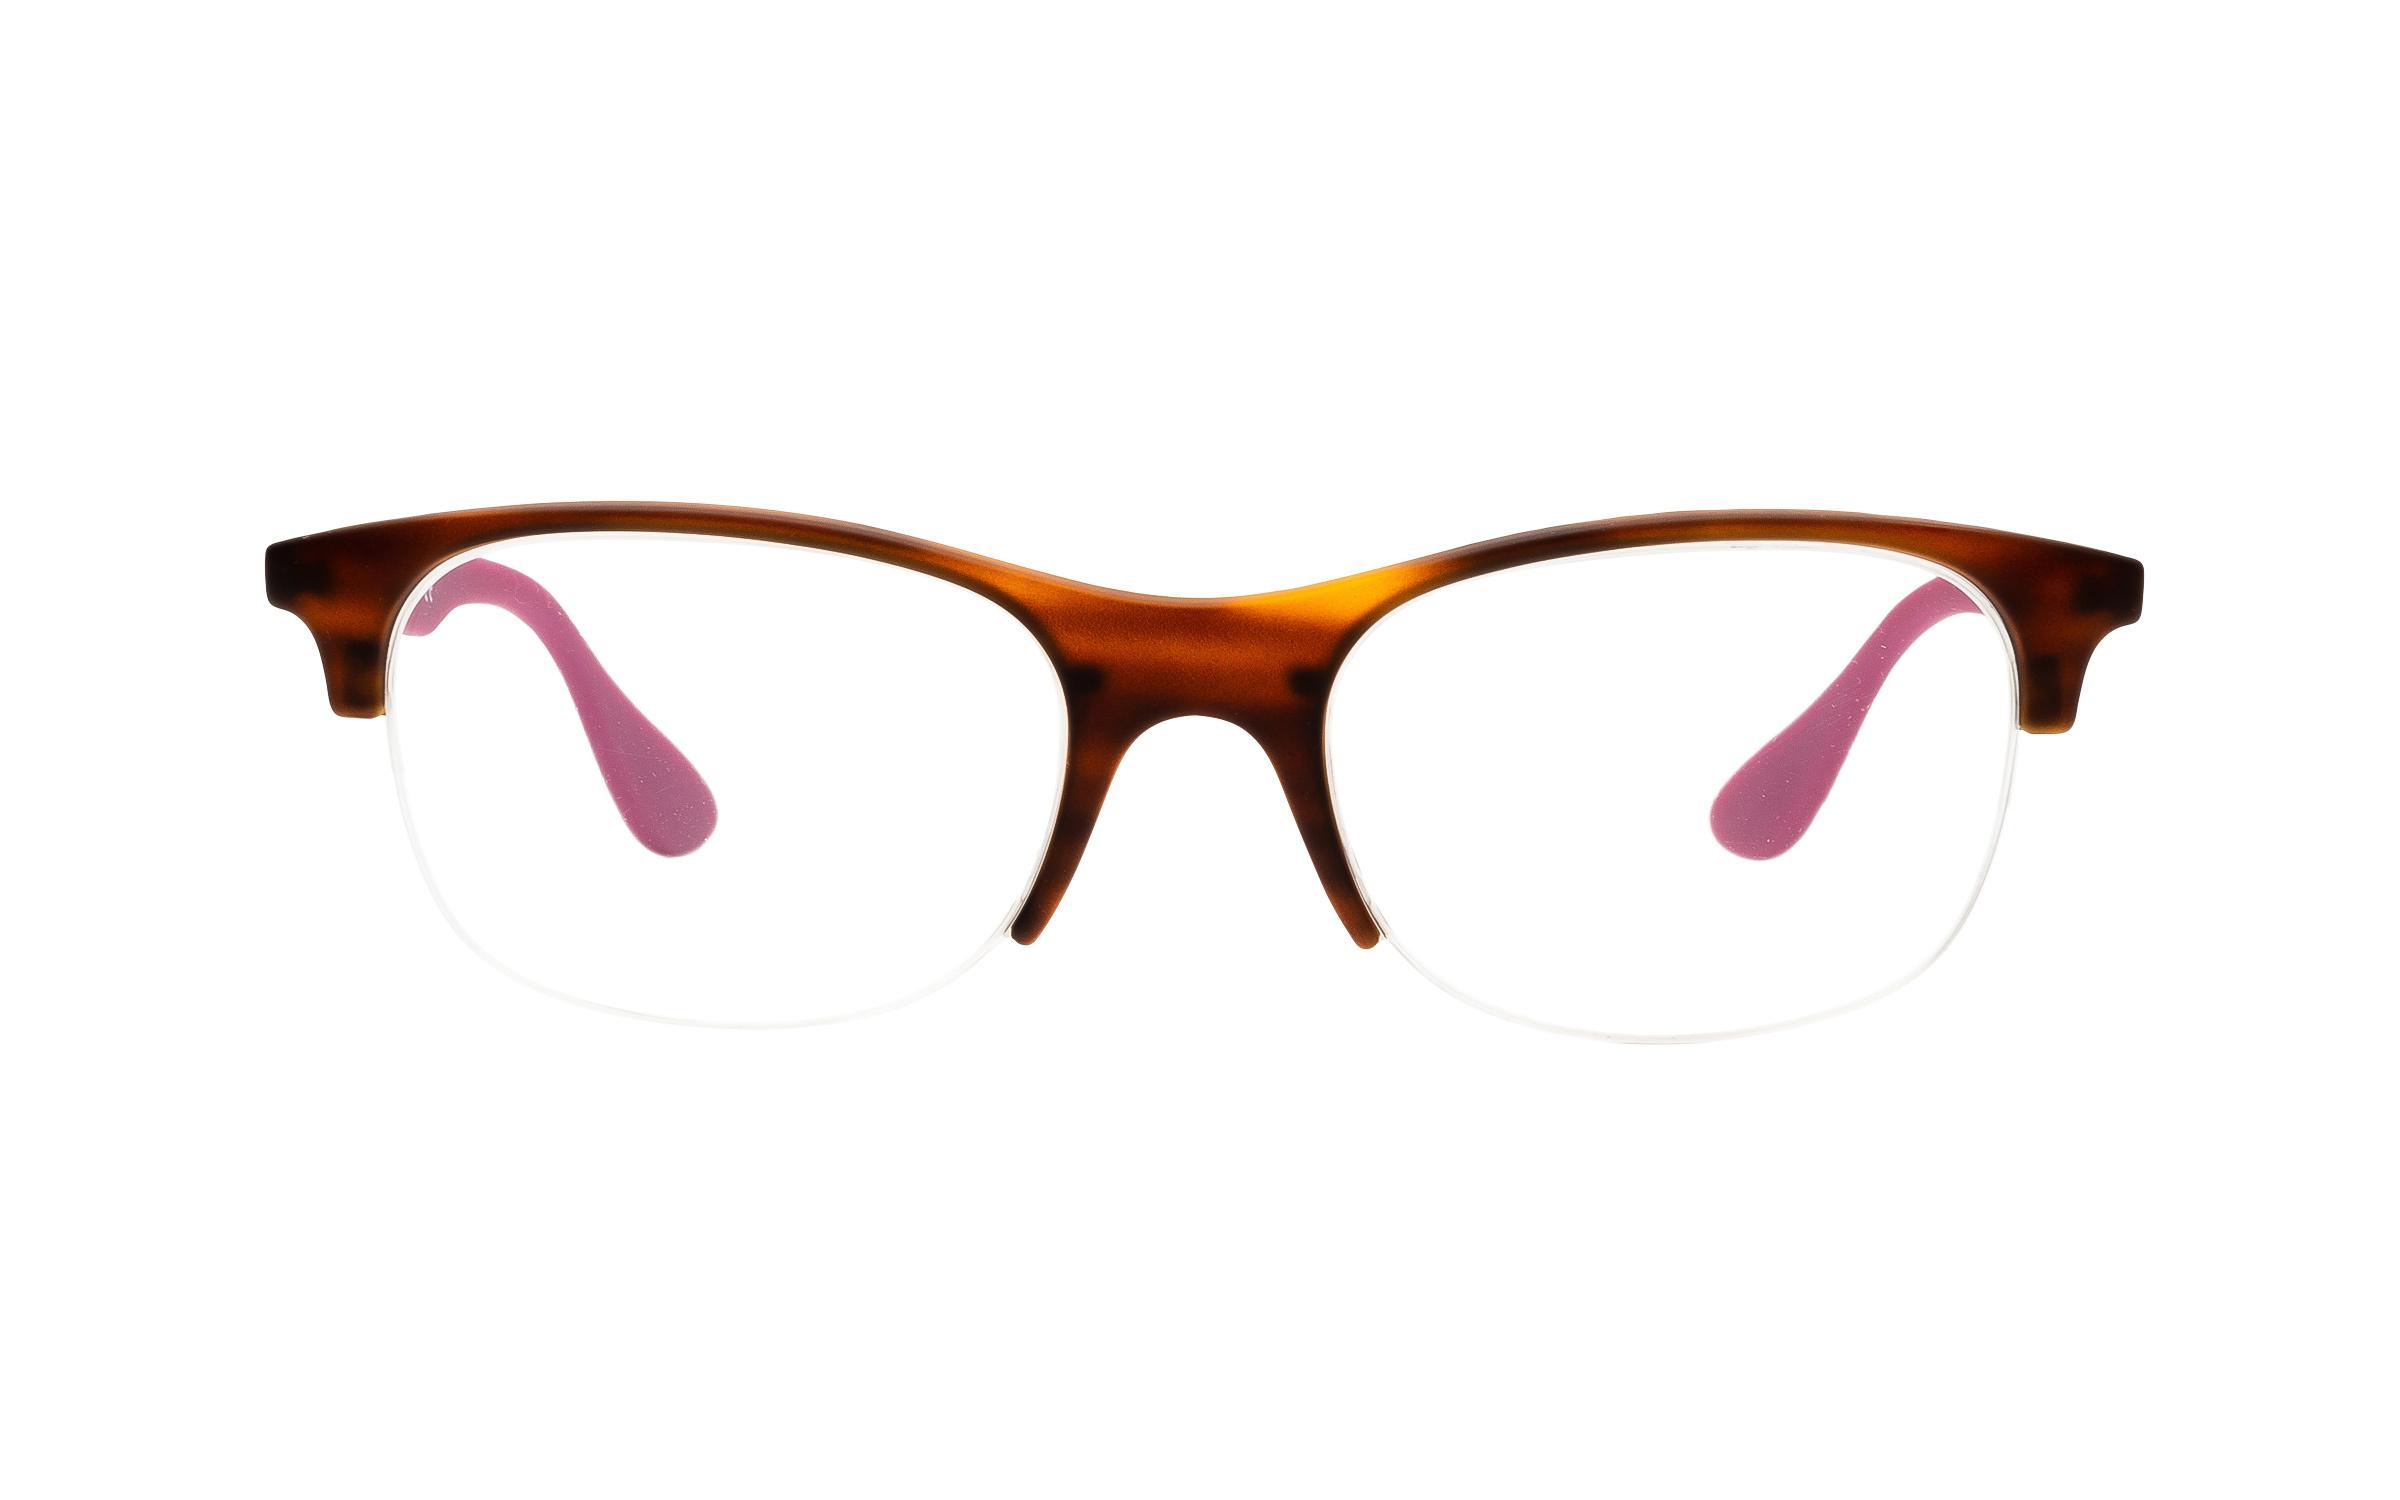 Luxottica Ray-Ban RX4419V 5889 (54) Eyeglasses and Frame in Red Havana Tortoise - Online Coastal